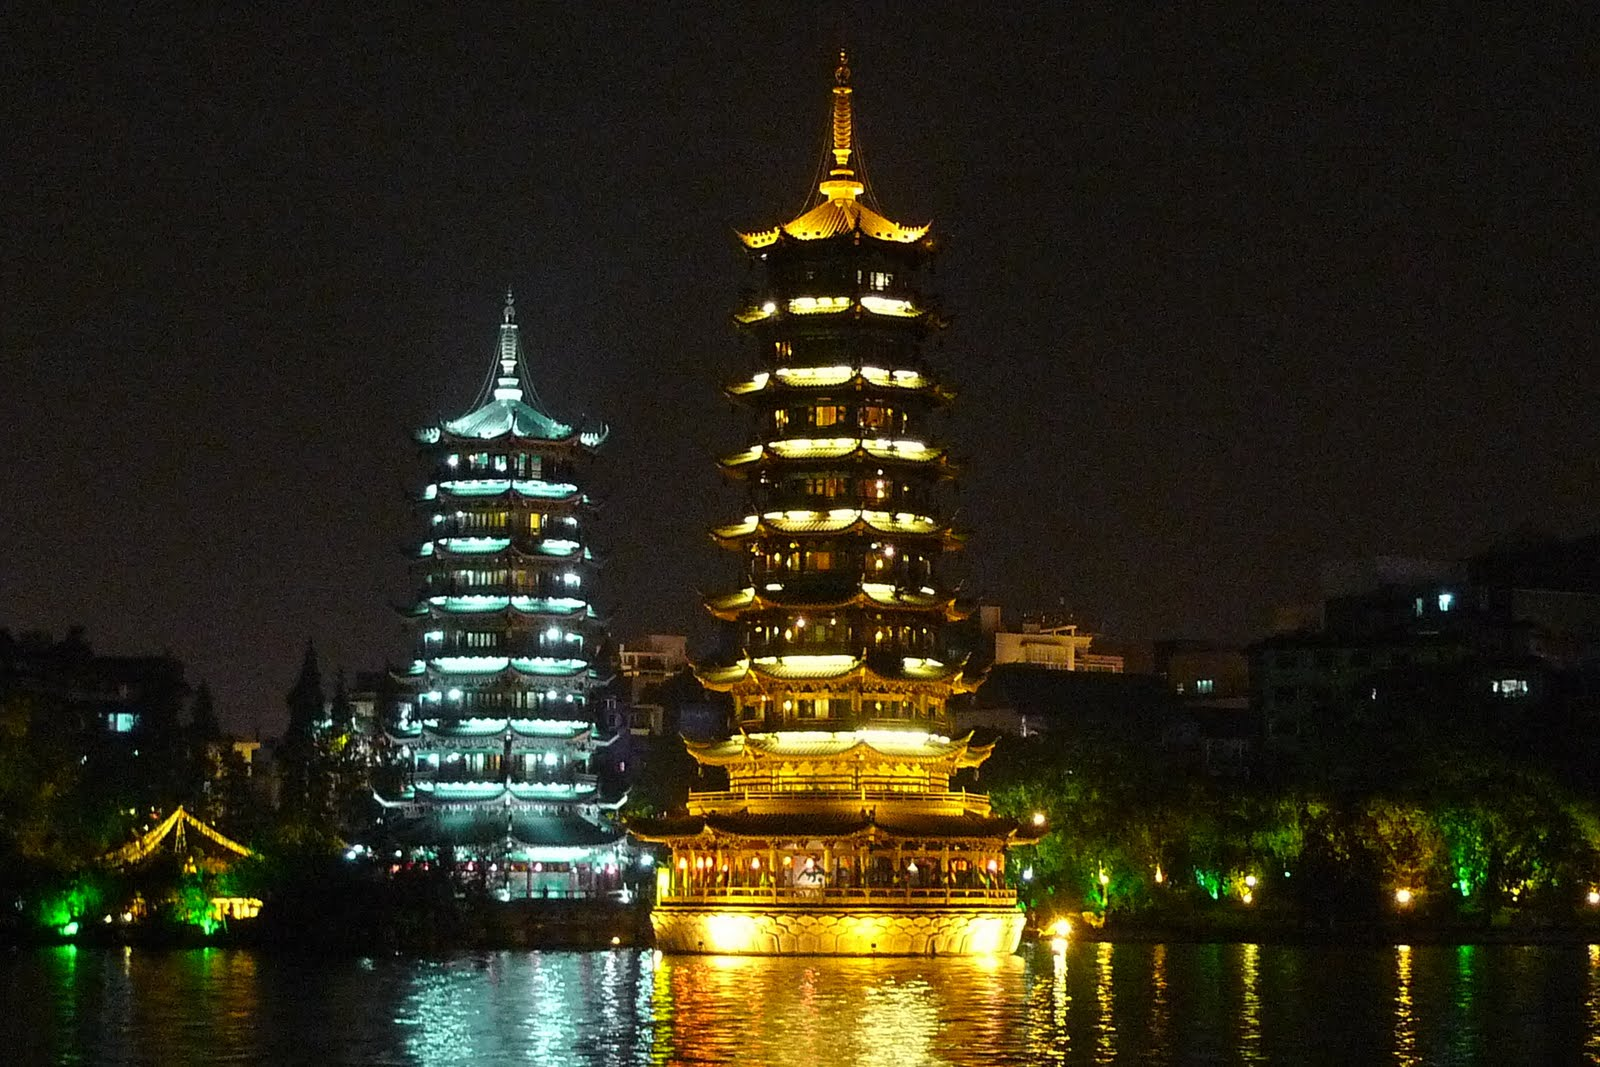 http://2.bp.blogspot.com/_qgDh0CvuSMg/TM1_qlc0WuI/AAAAAAAADH0/SR4md_HqiCM/s1600/pagoda%2B4.jpg